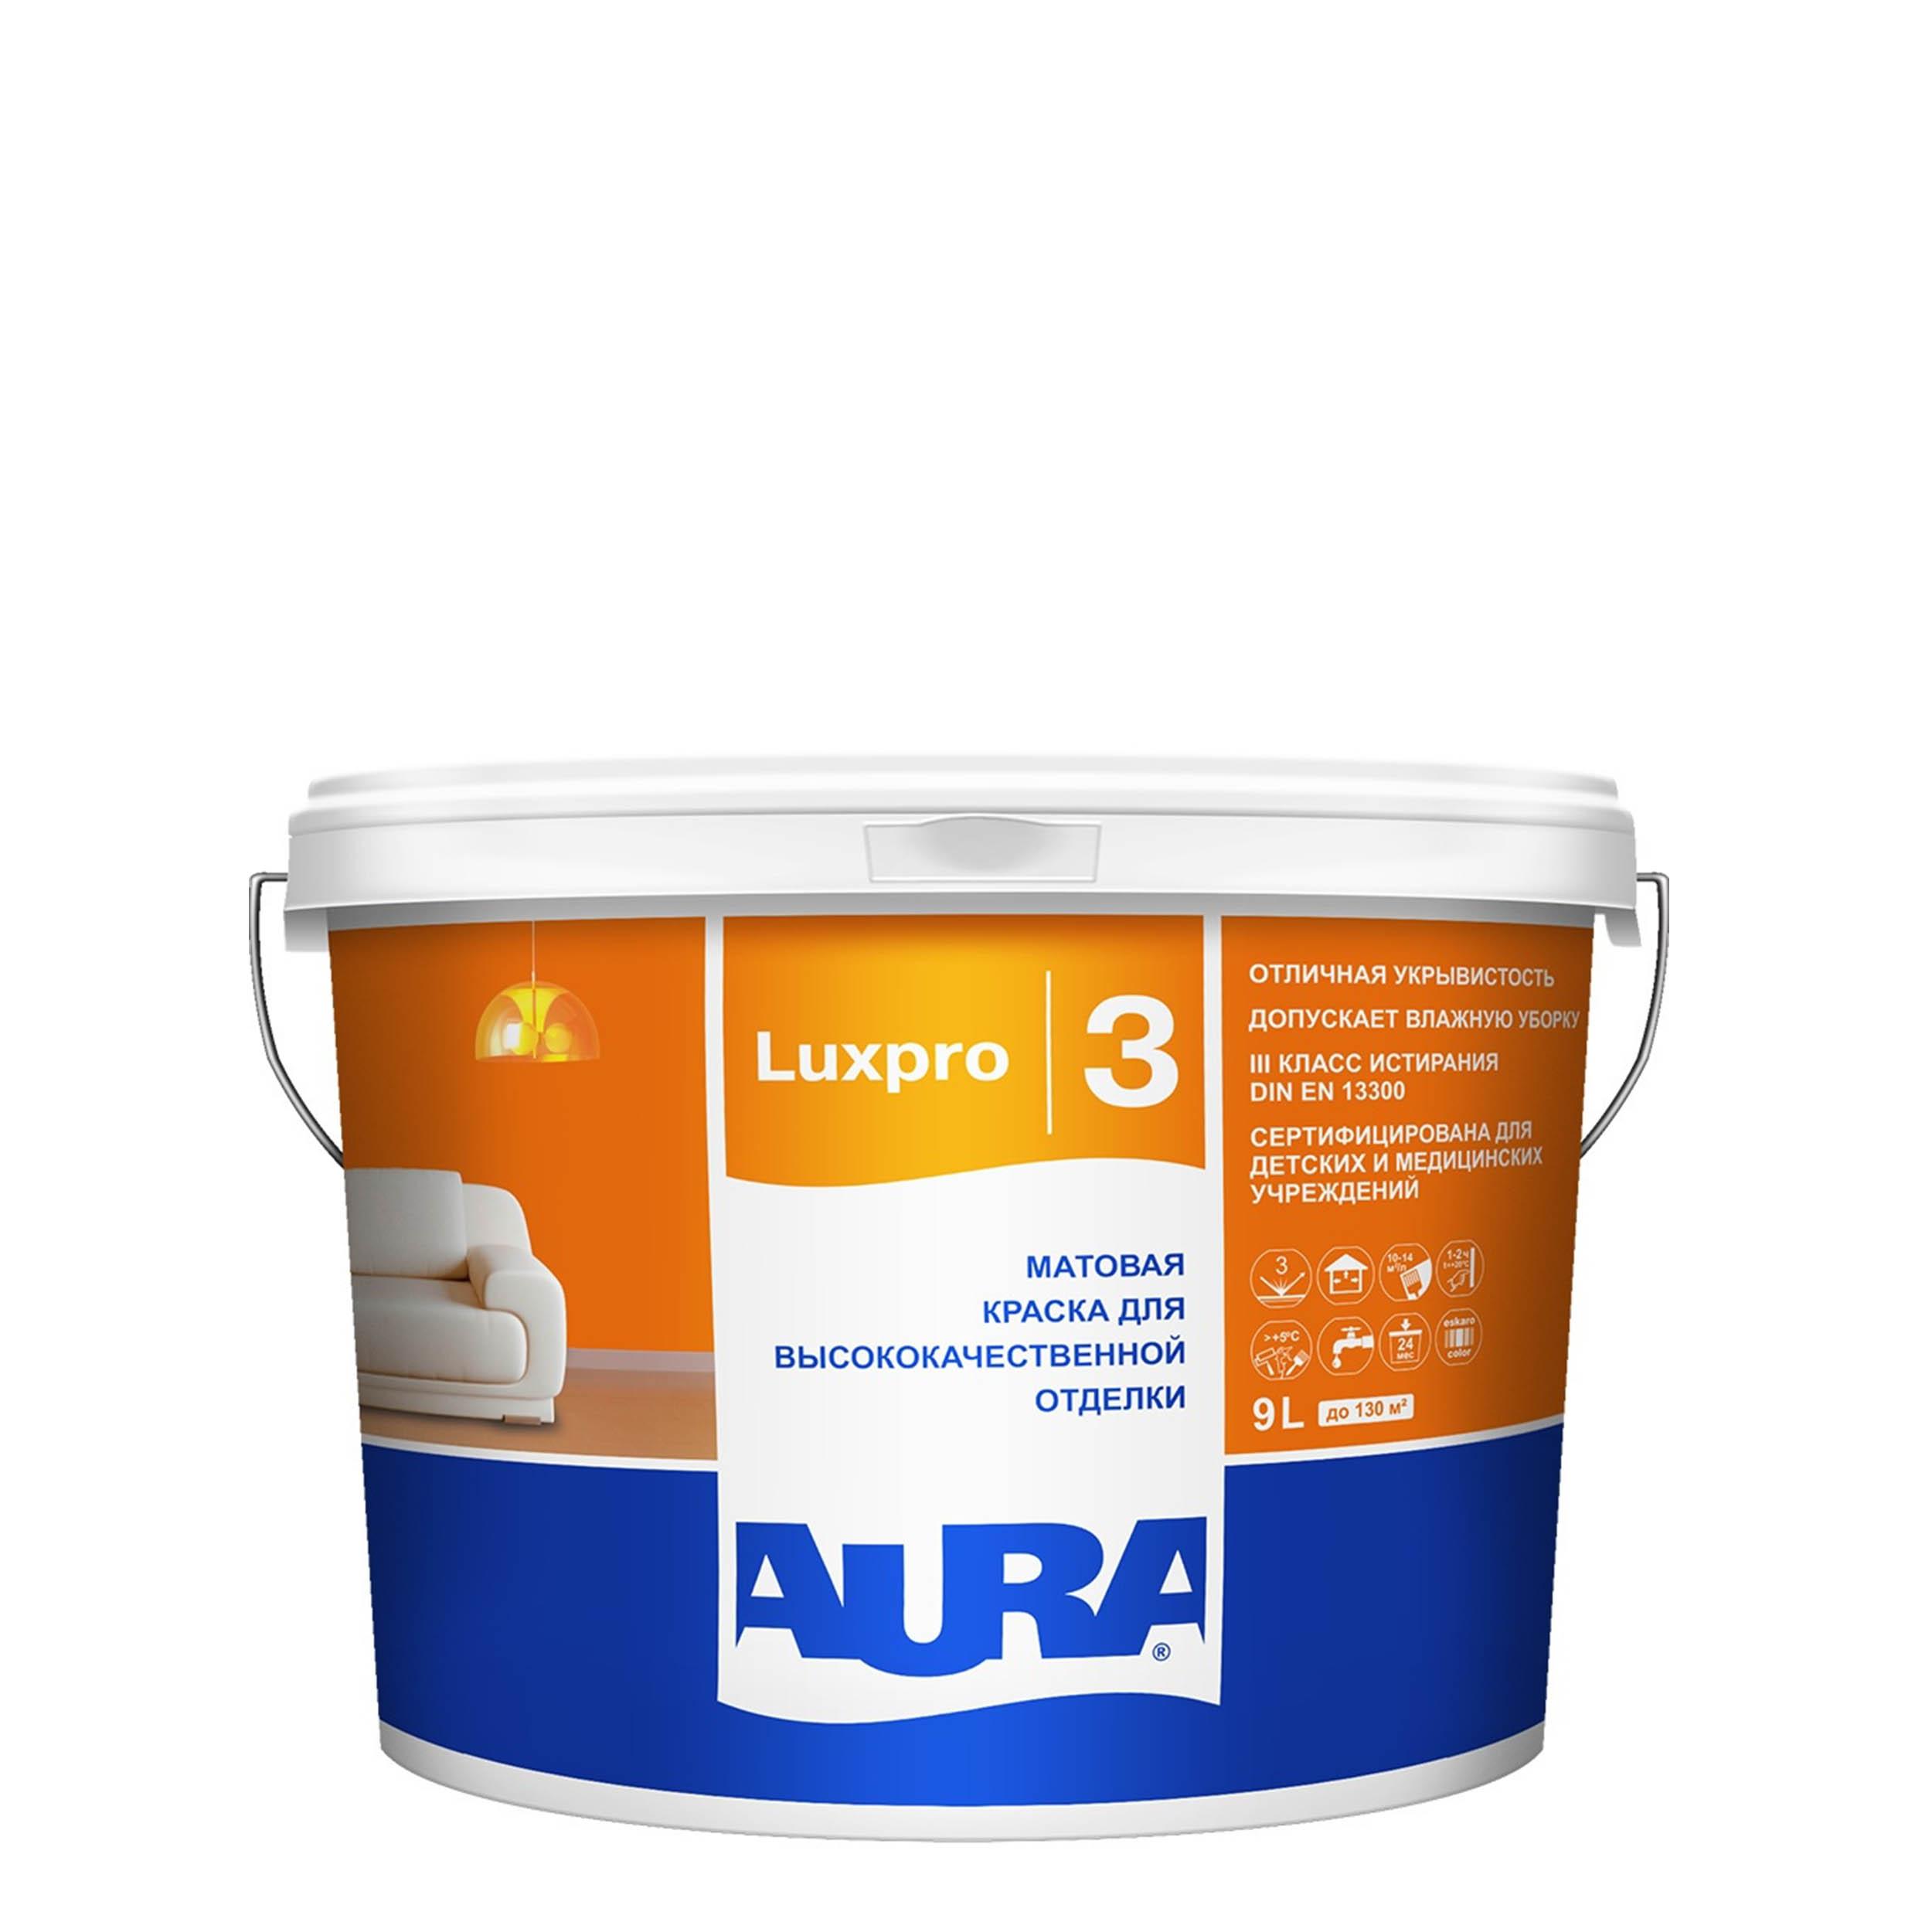 Фото 4 - Краска интерьерная, Aura LuxPRO 3, RAL 7005, 11 кг.